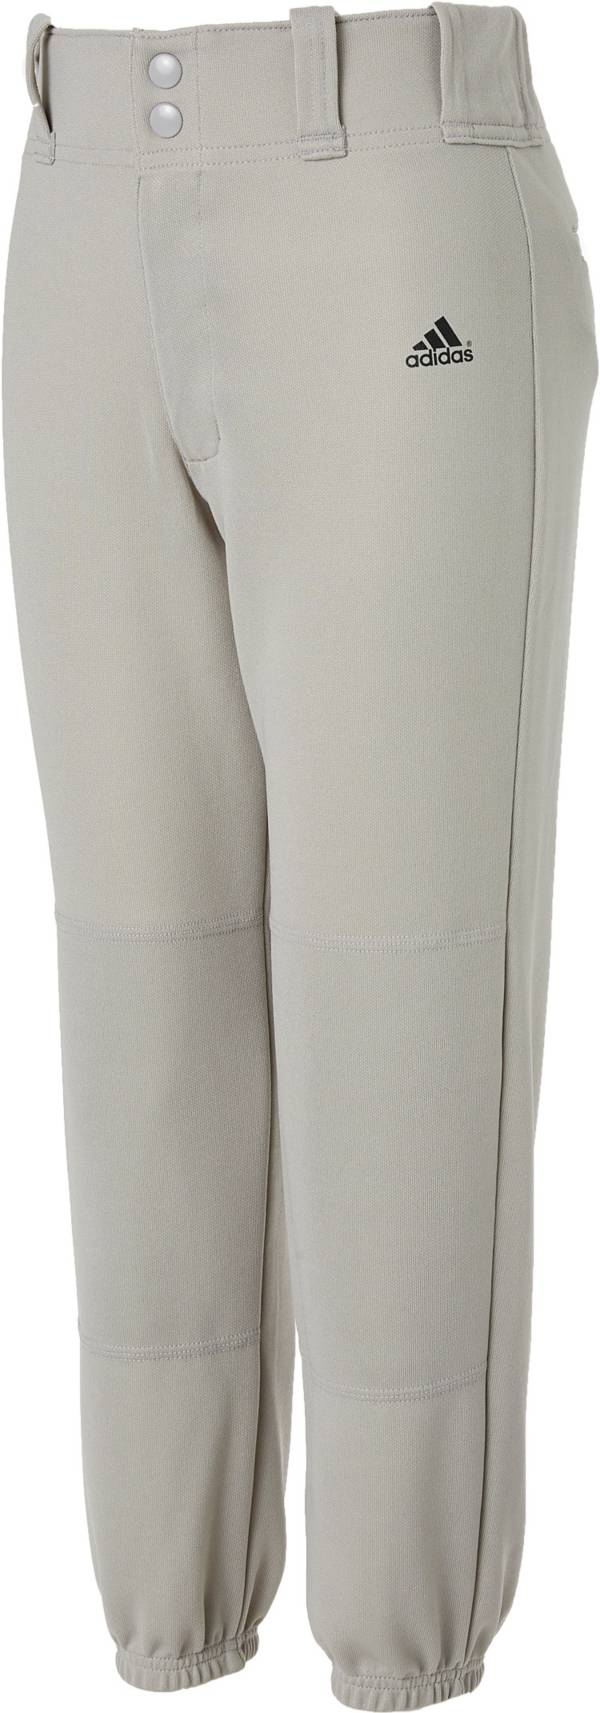 adidas Boys' Triple Stripe Traditional Baseball Pants product image